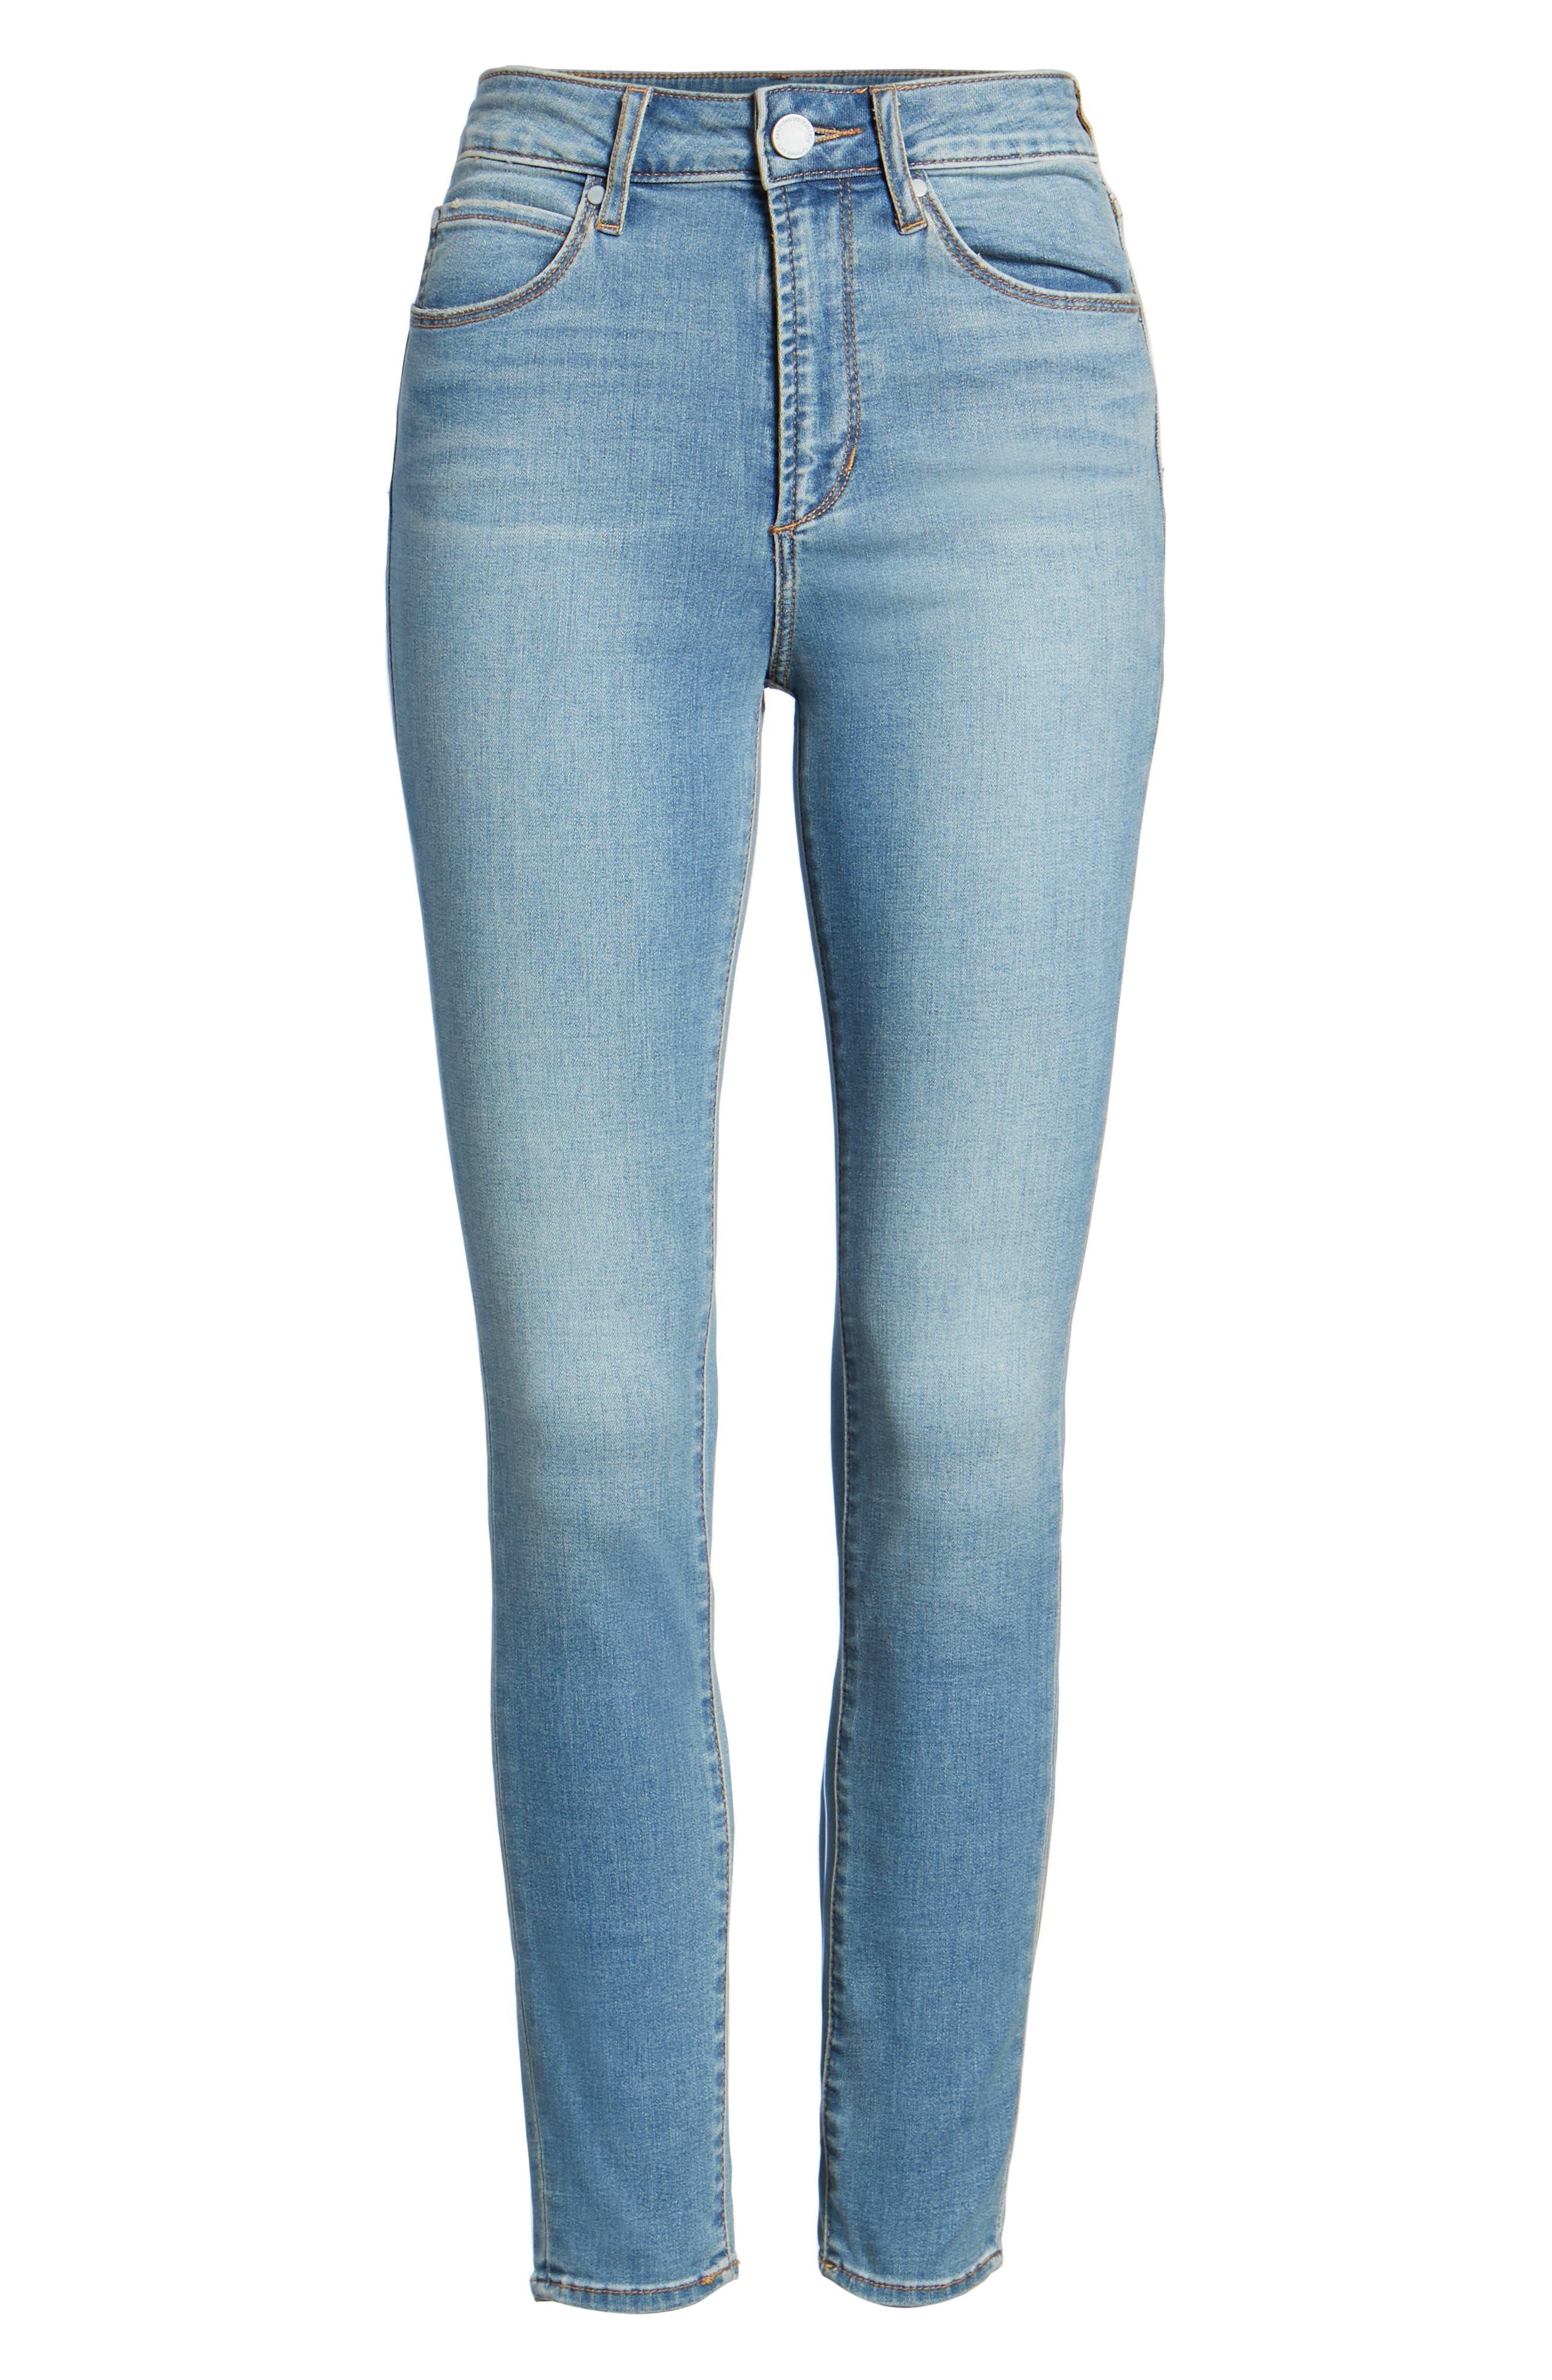 Heather High Waist Skinny Jeans,                             Alternate thumbnail 7, color,                             481